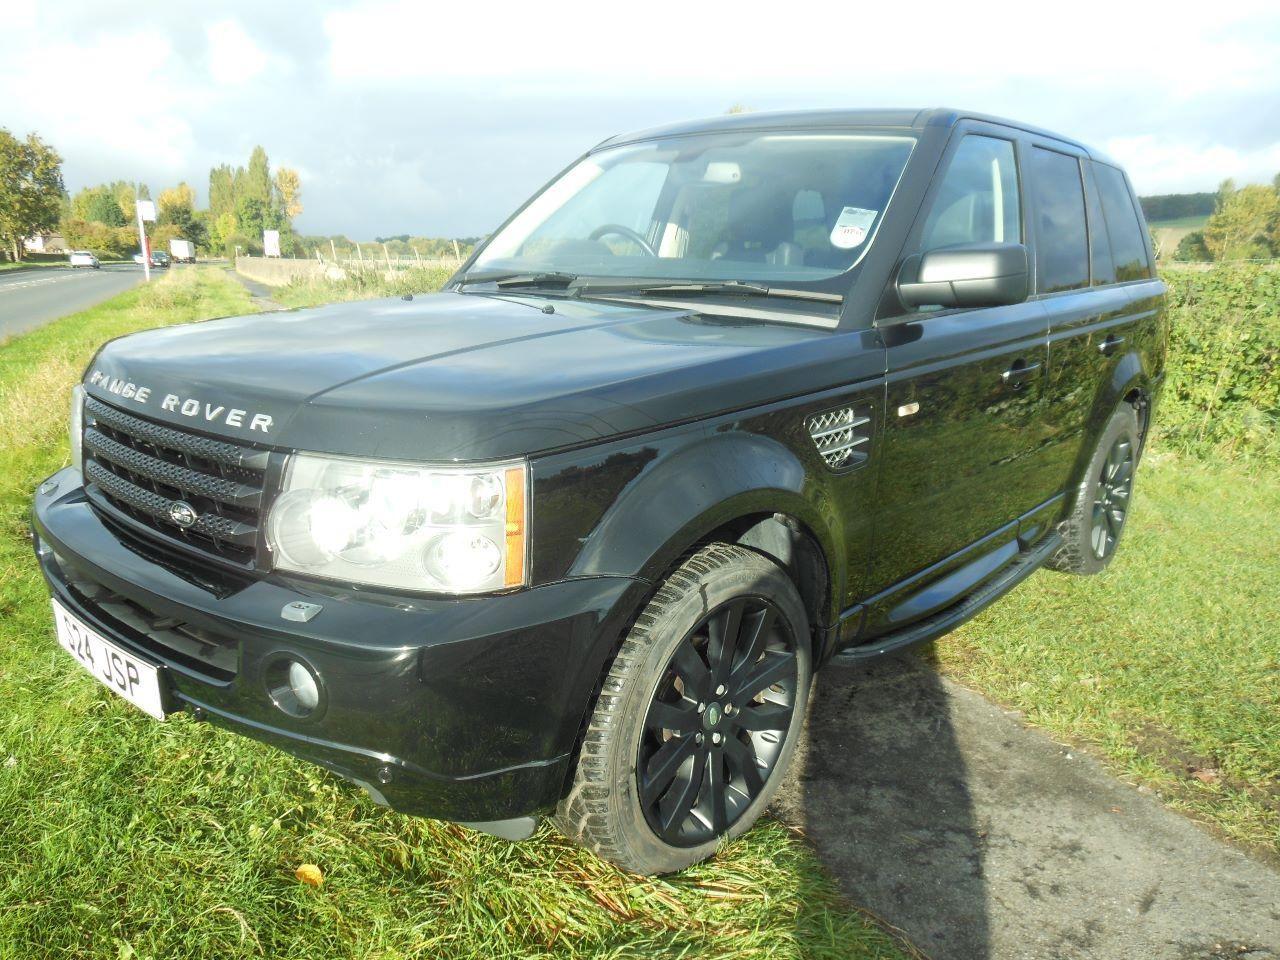 2006 Range Rover Sport 2.7 HSE auto 4x4. Black. FSH. Click